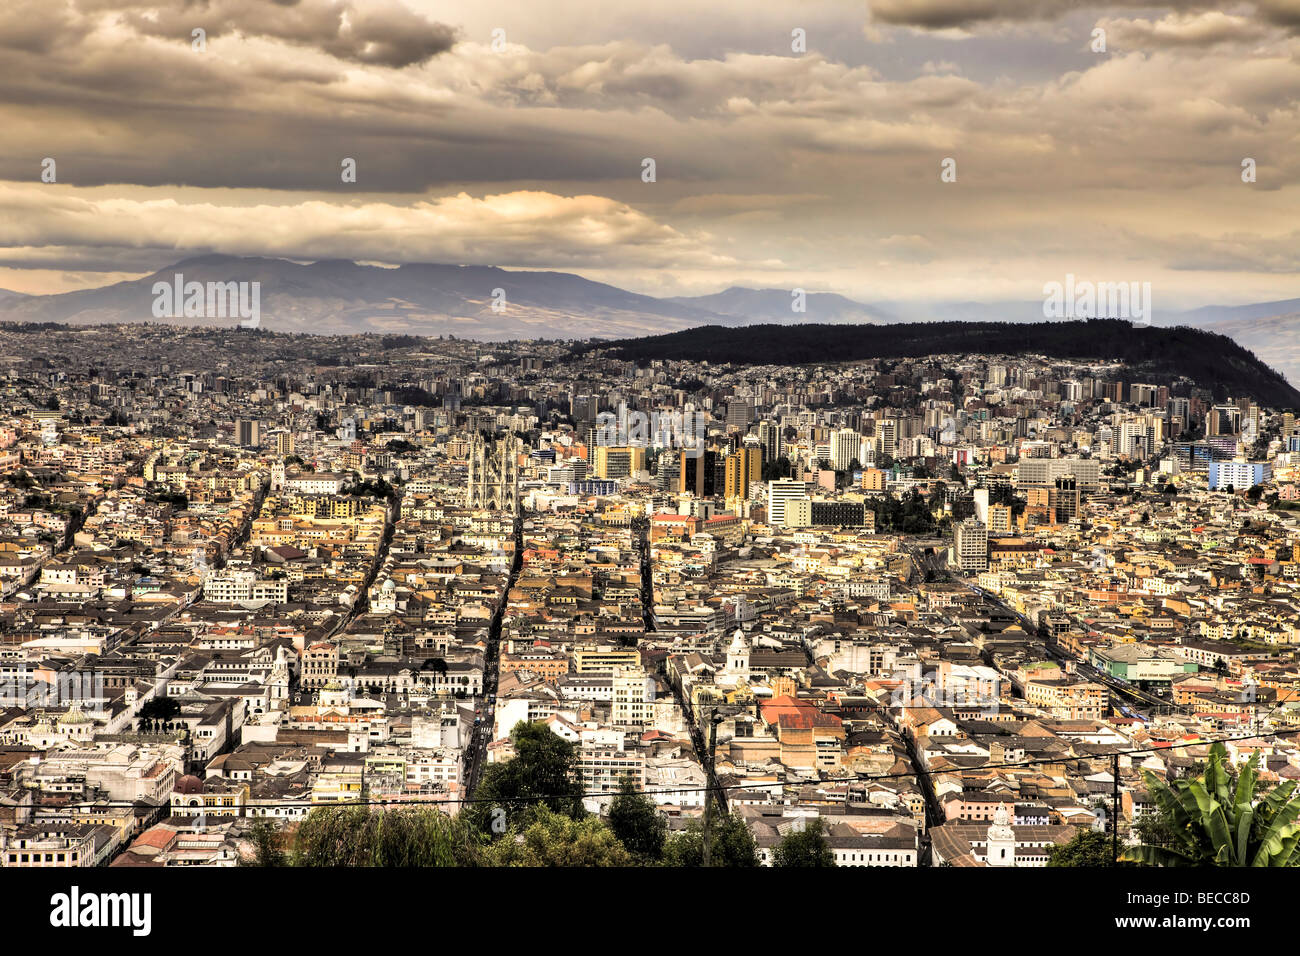 Quito at Dusk, Ecuador - Stock Image